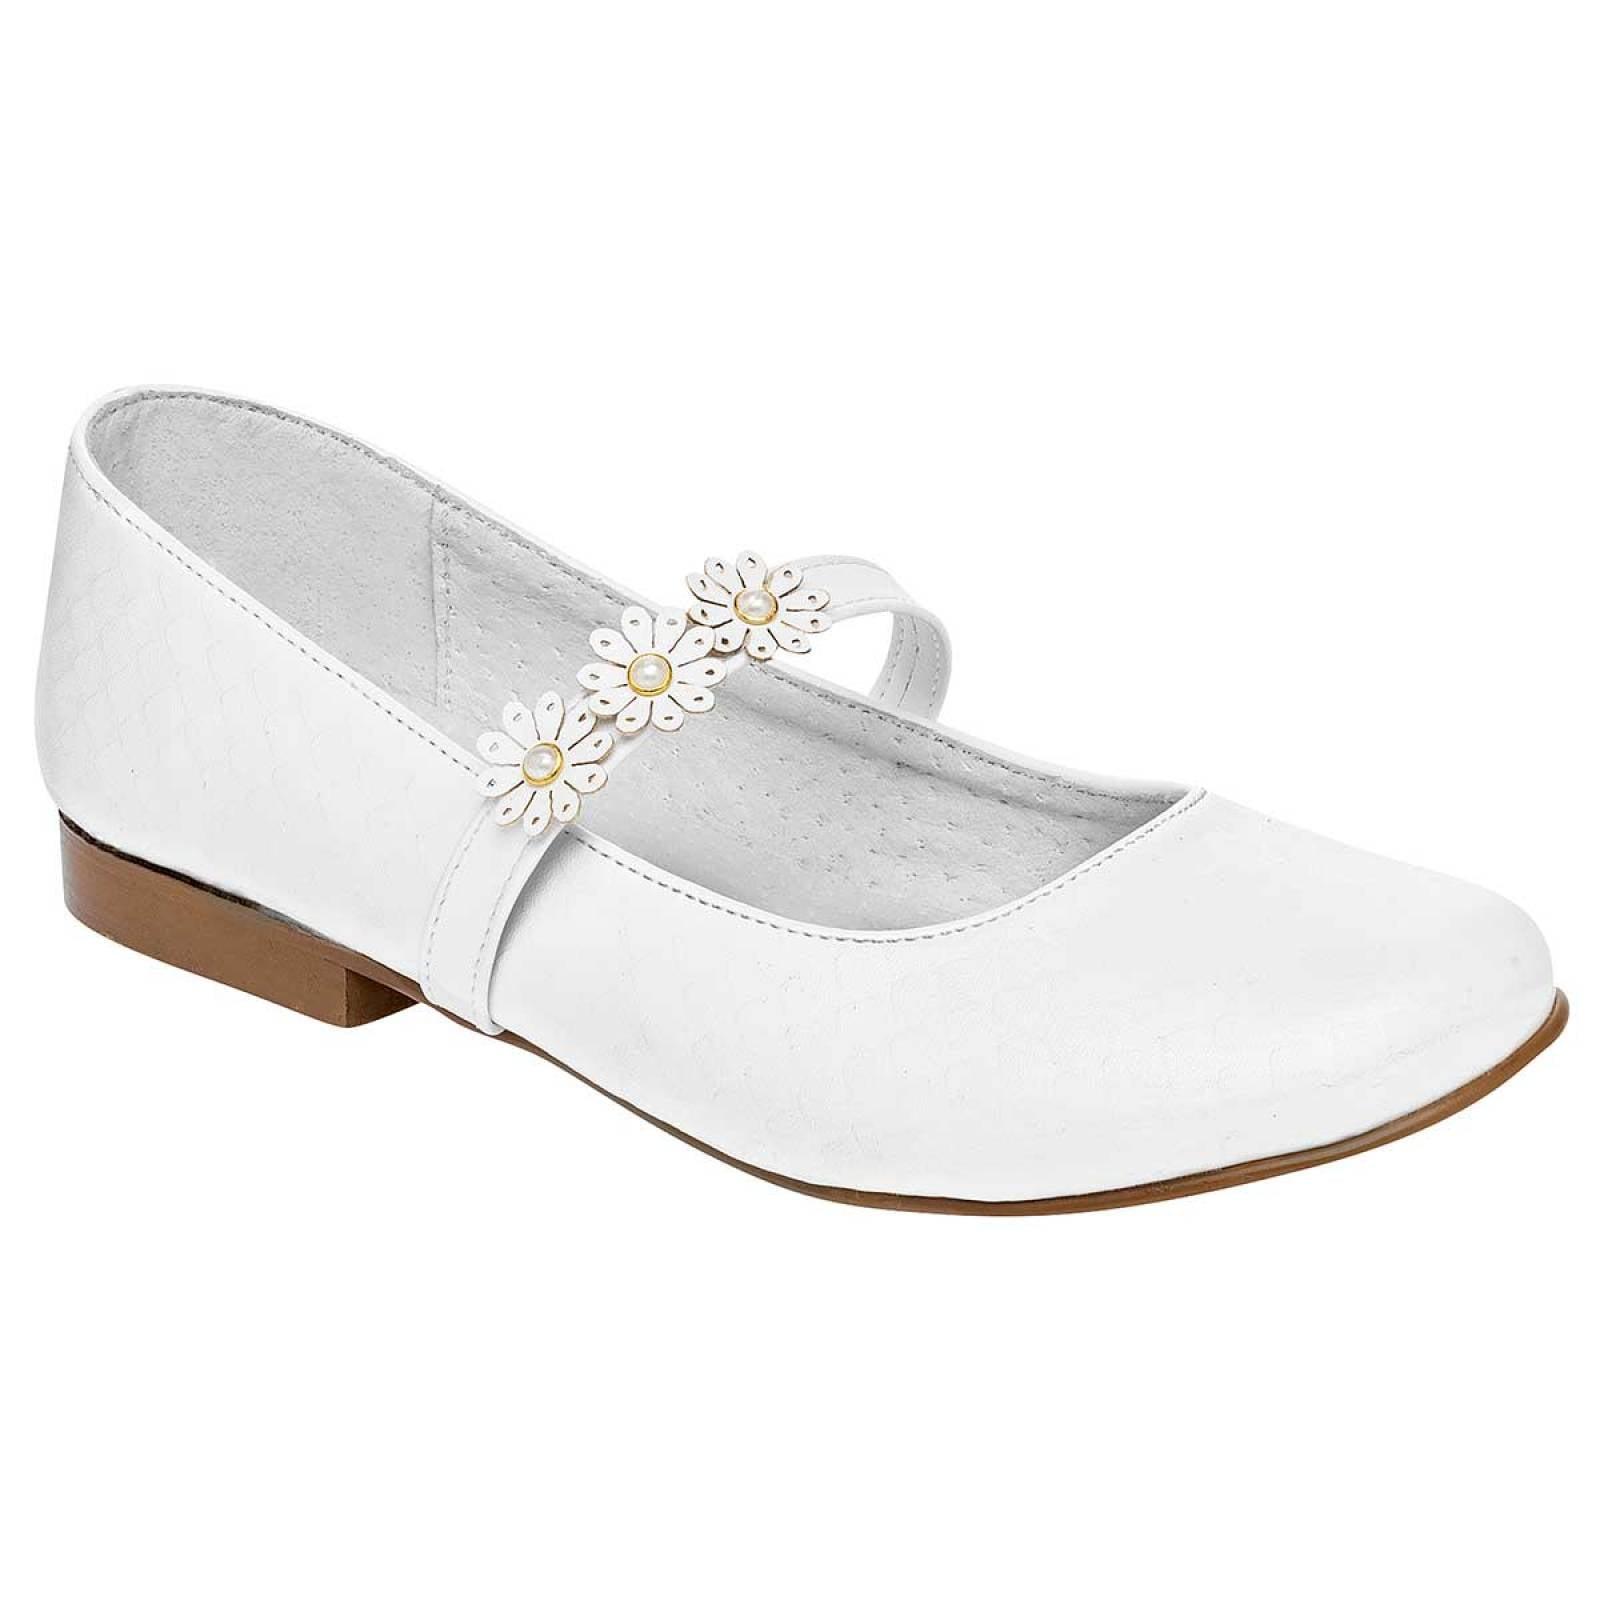 Adriana's Zapato Mujer Blanco